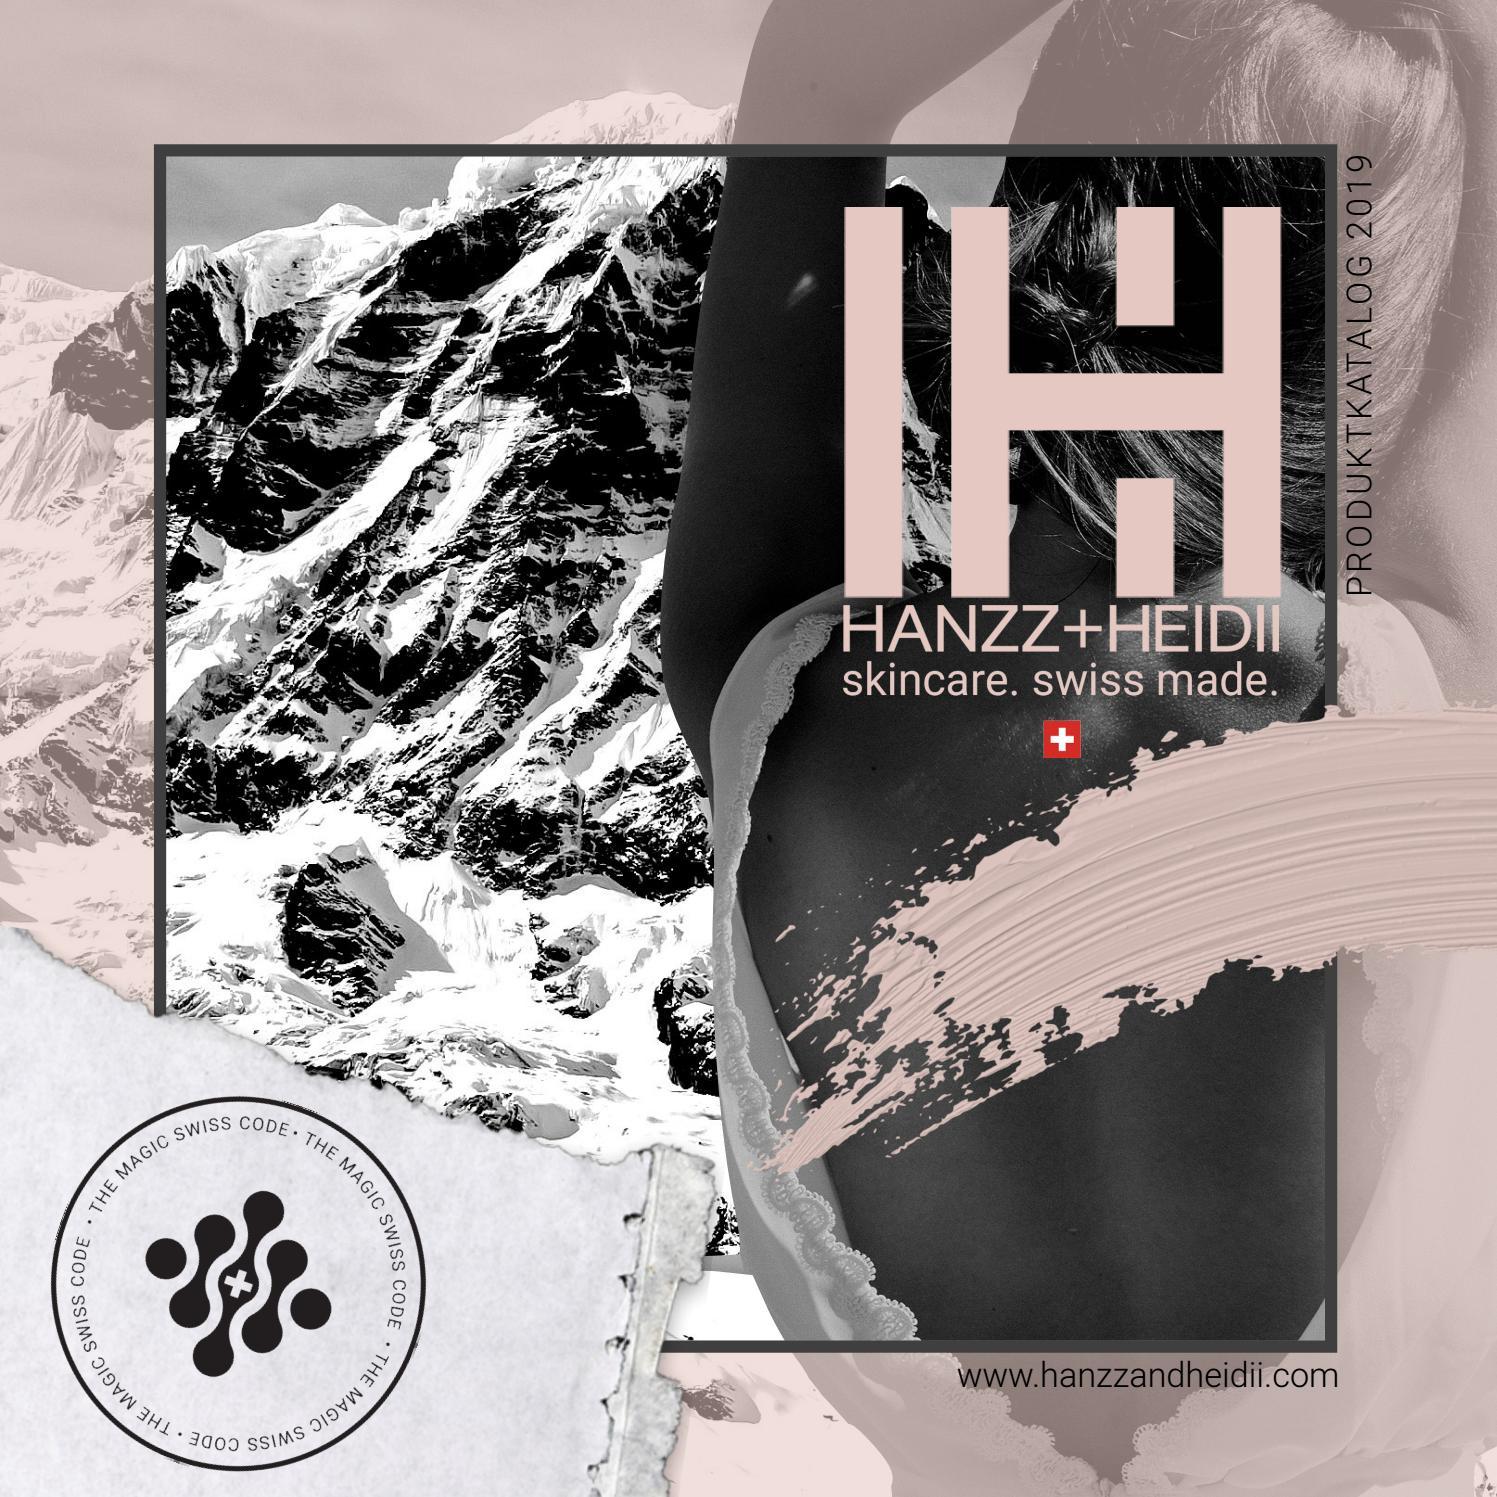 HANZZ+HEIDII Product Catalog | German by HANZZ+HEIDII - issuu